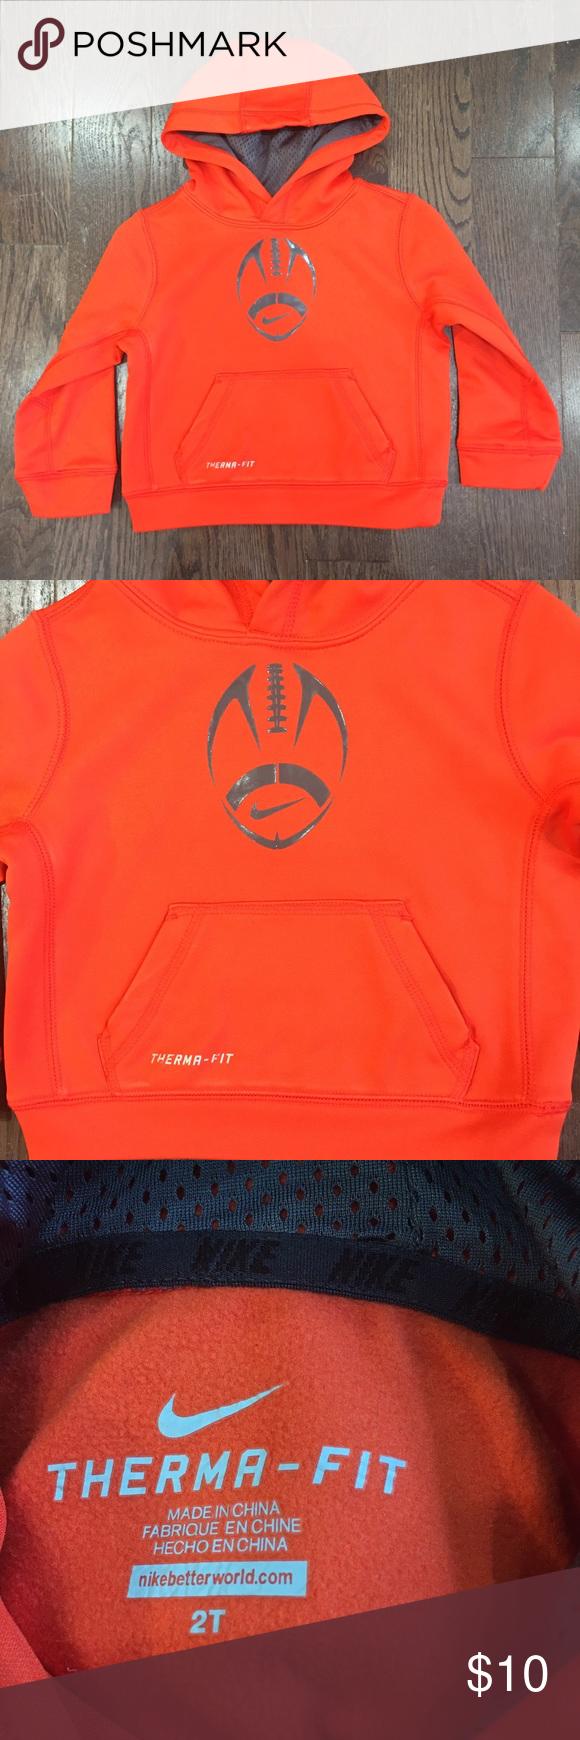 3T Nike Boys Orange Hooded Sweatshirt Great condition Nike Shirts & Tops Sweatshirts & Hoodies